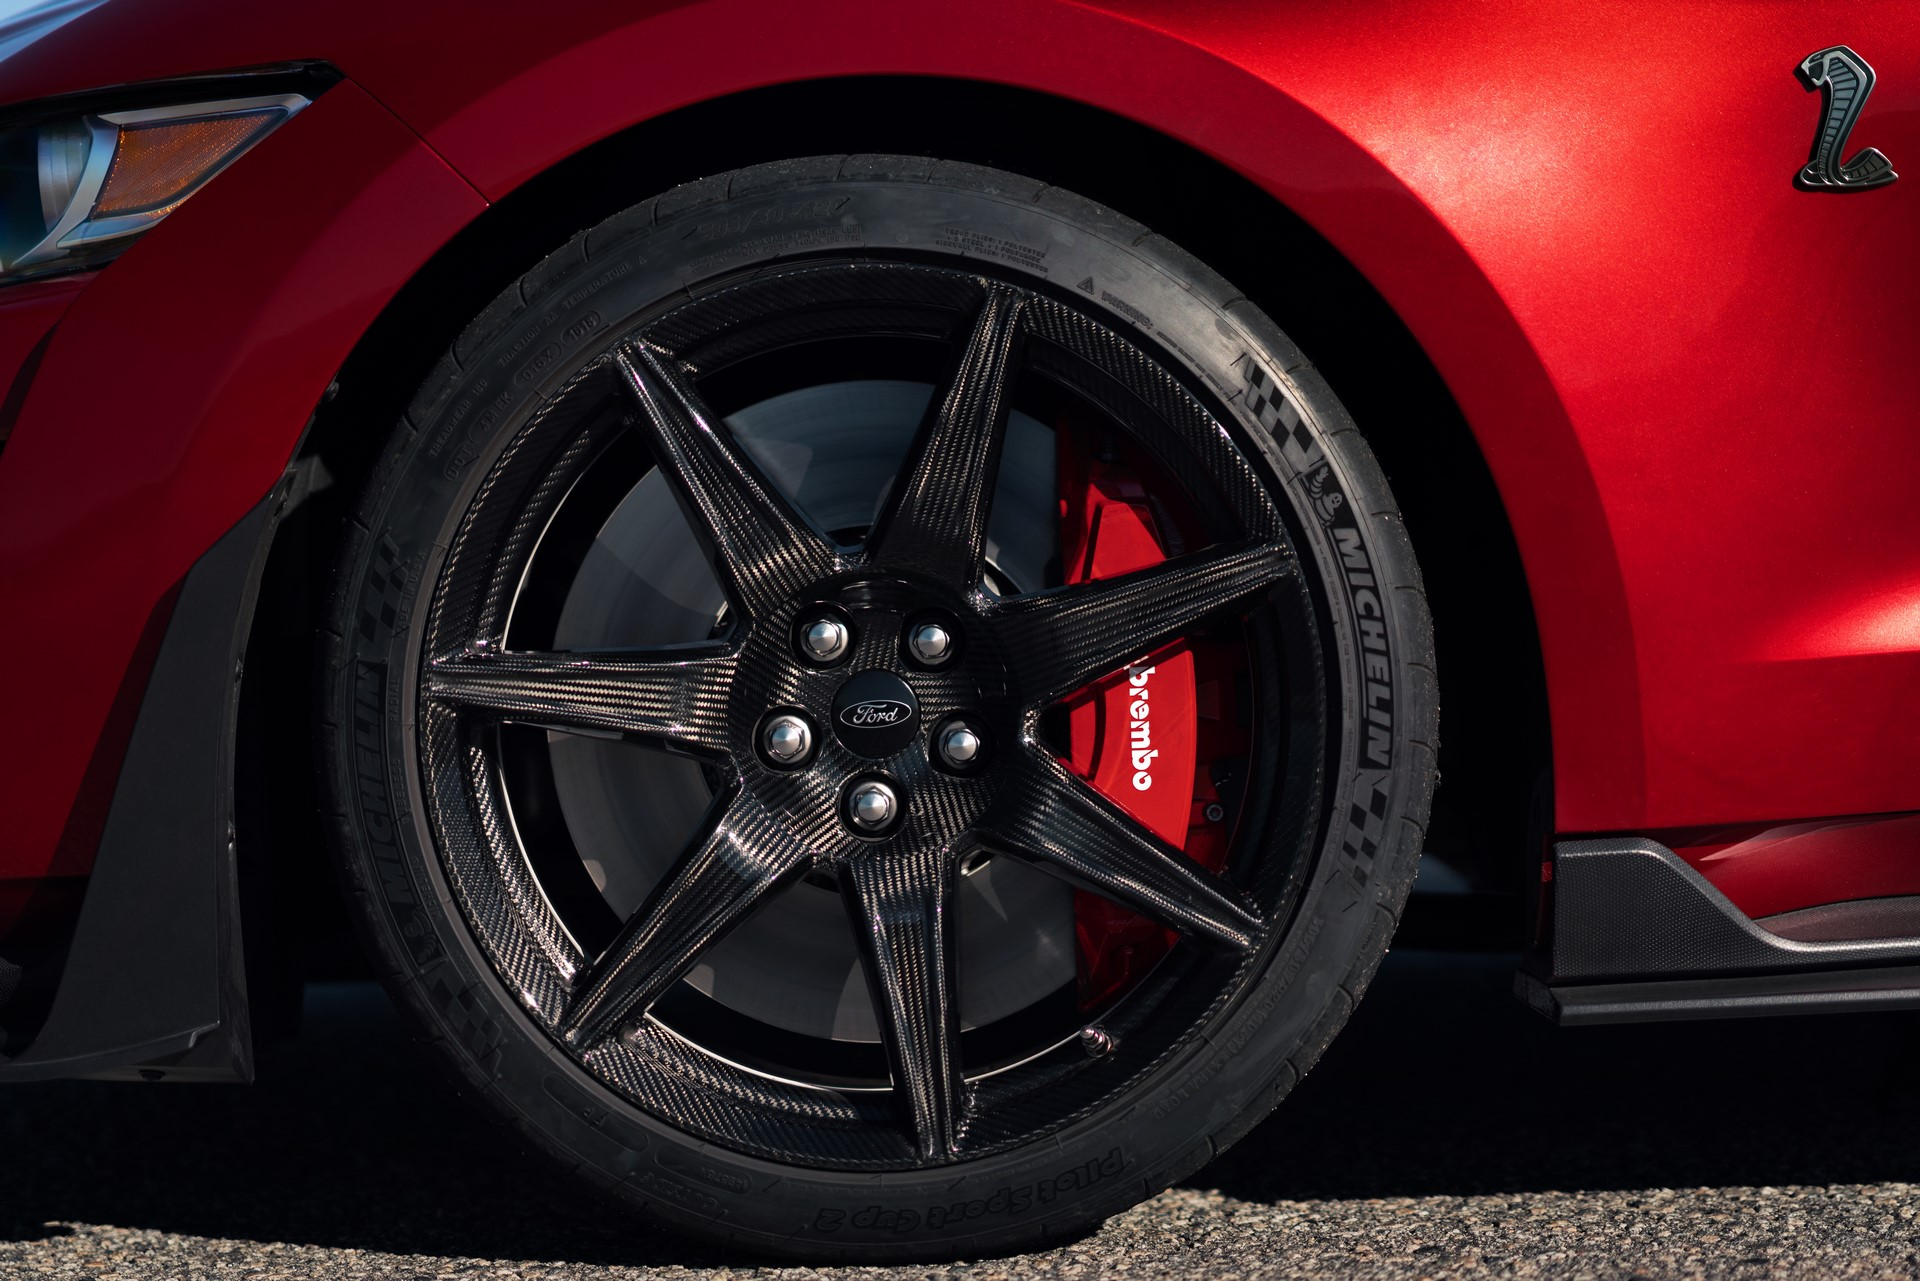 2020 Mustang Shelby GT500 wheel